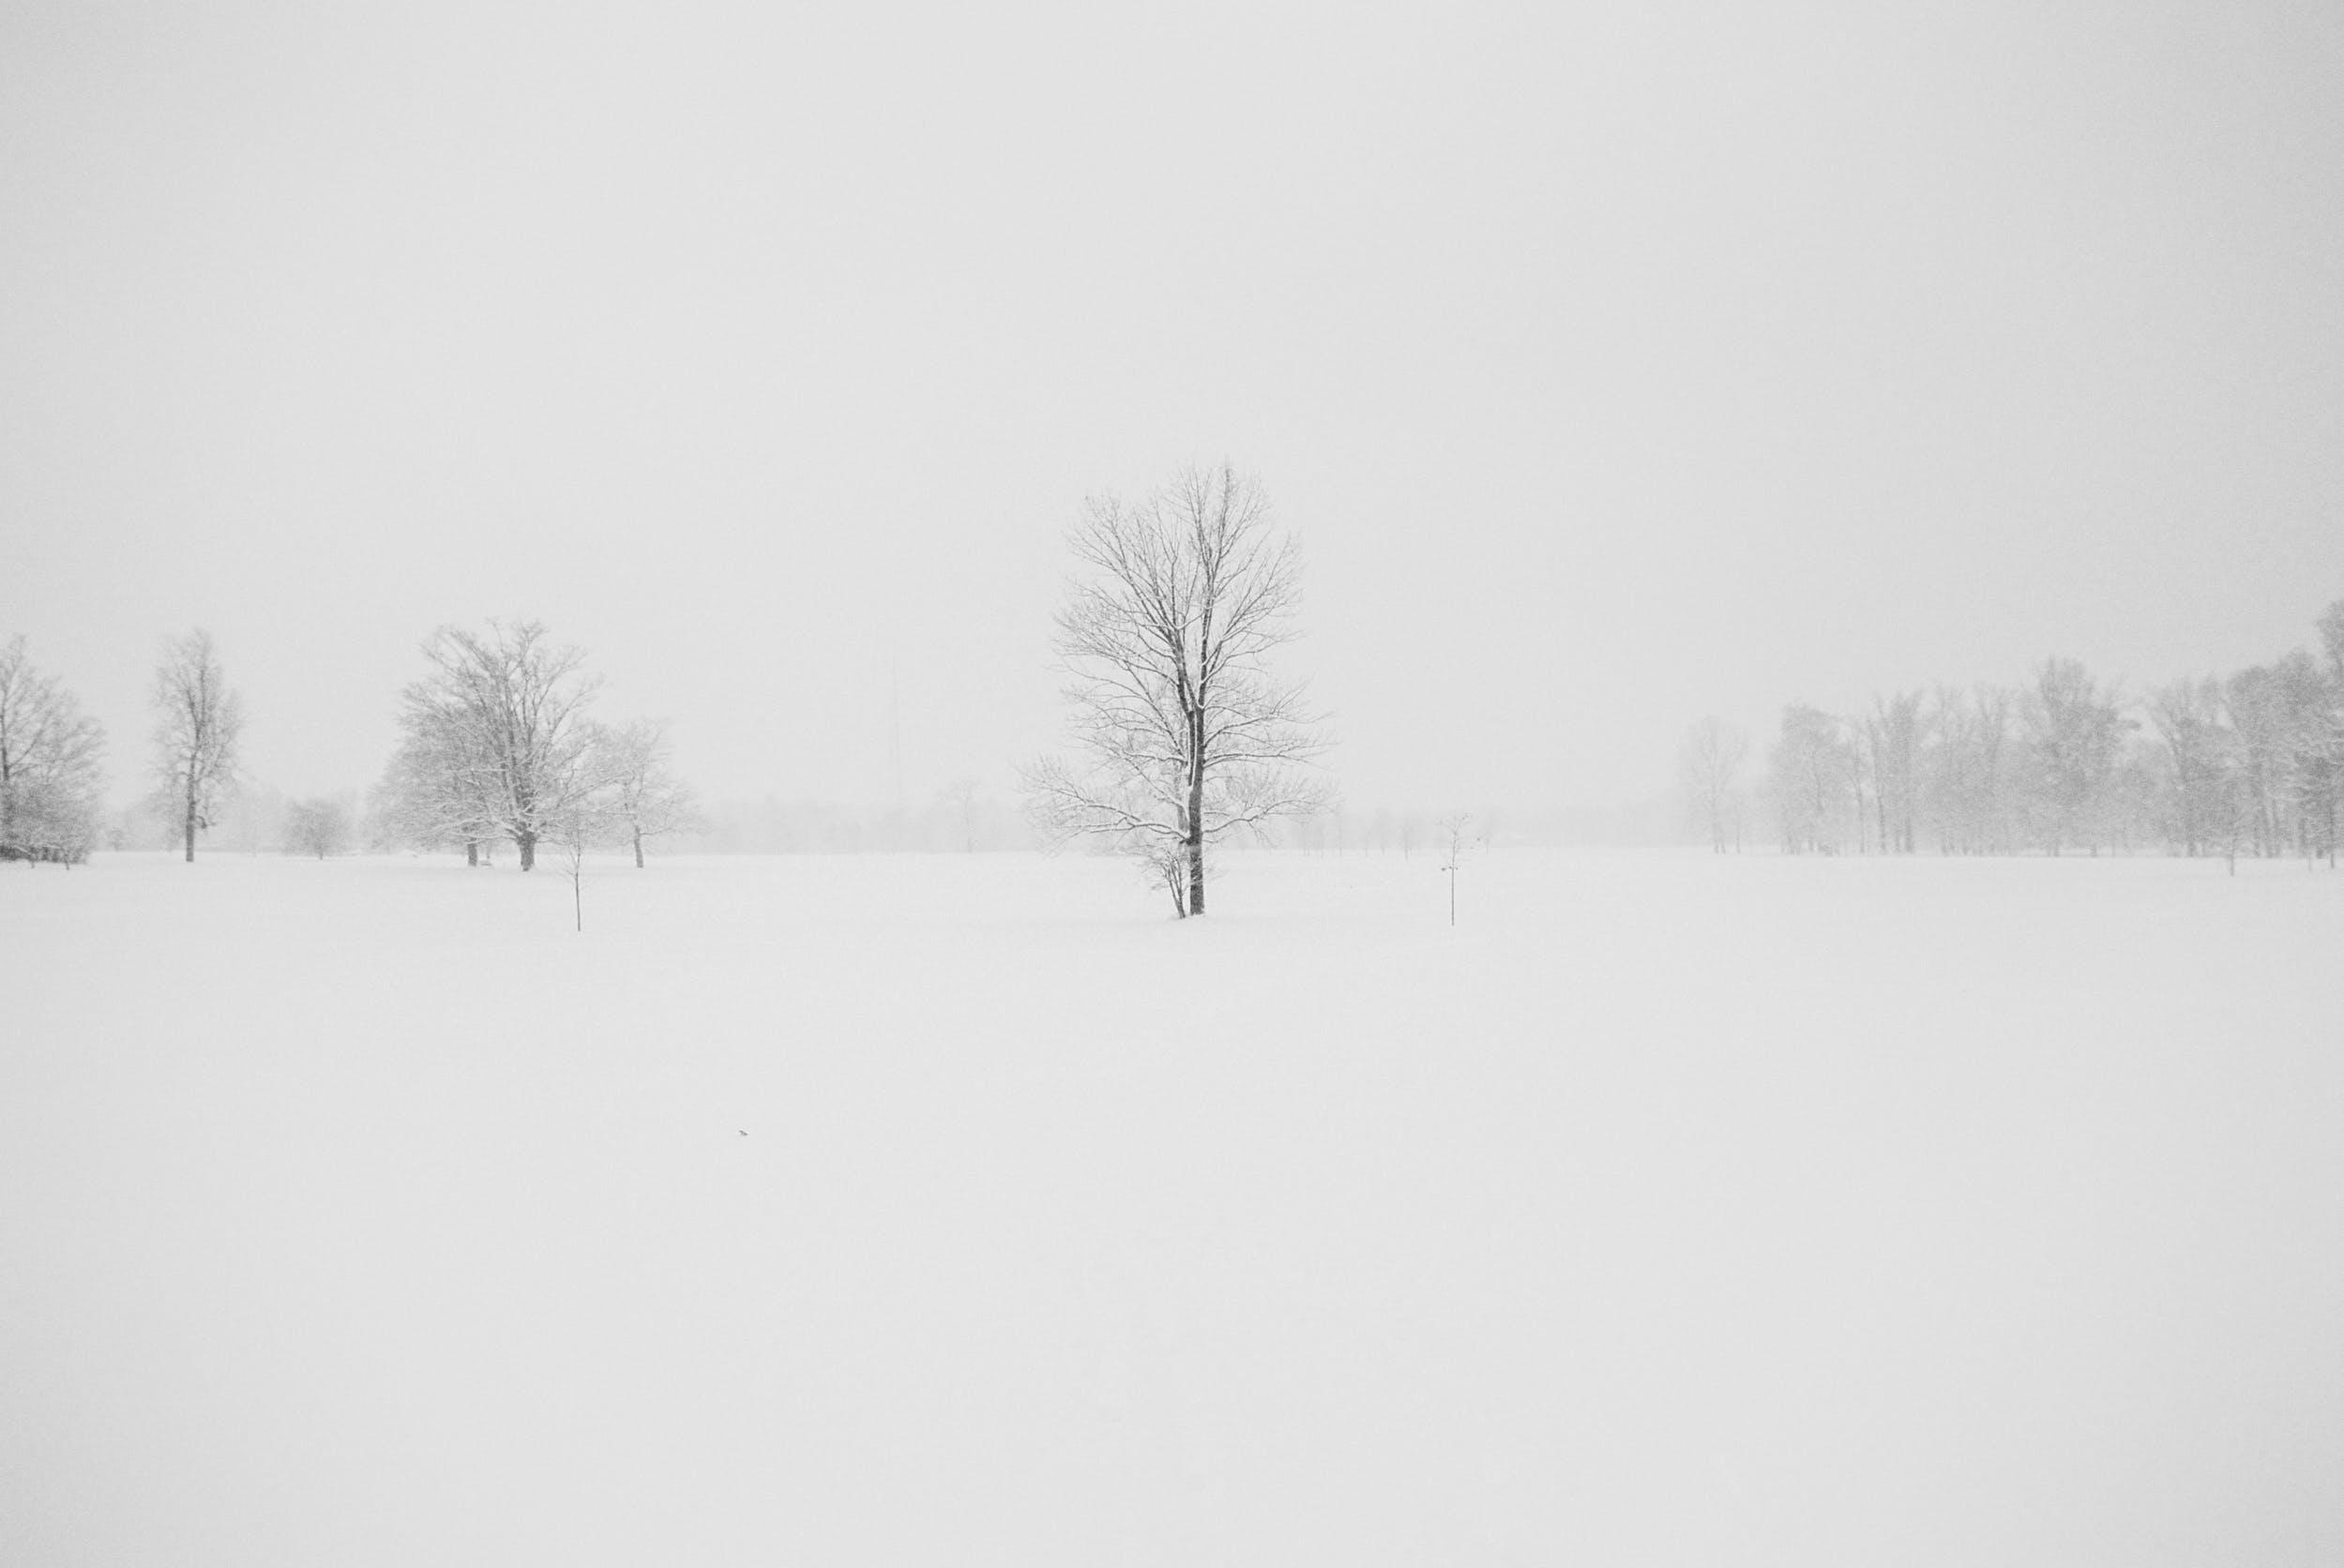 Kostenloses Stock Foto zu äste, bäume, dunstig, eis